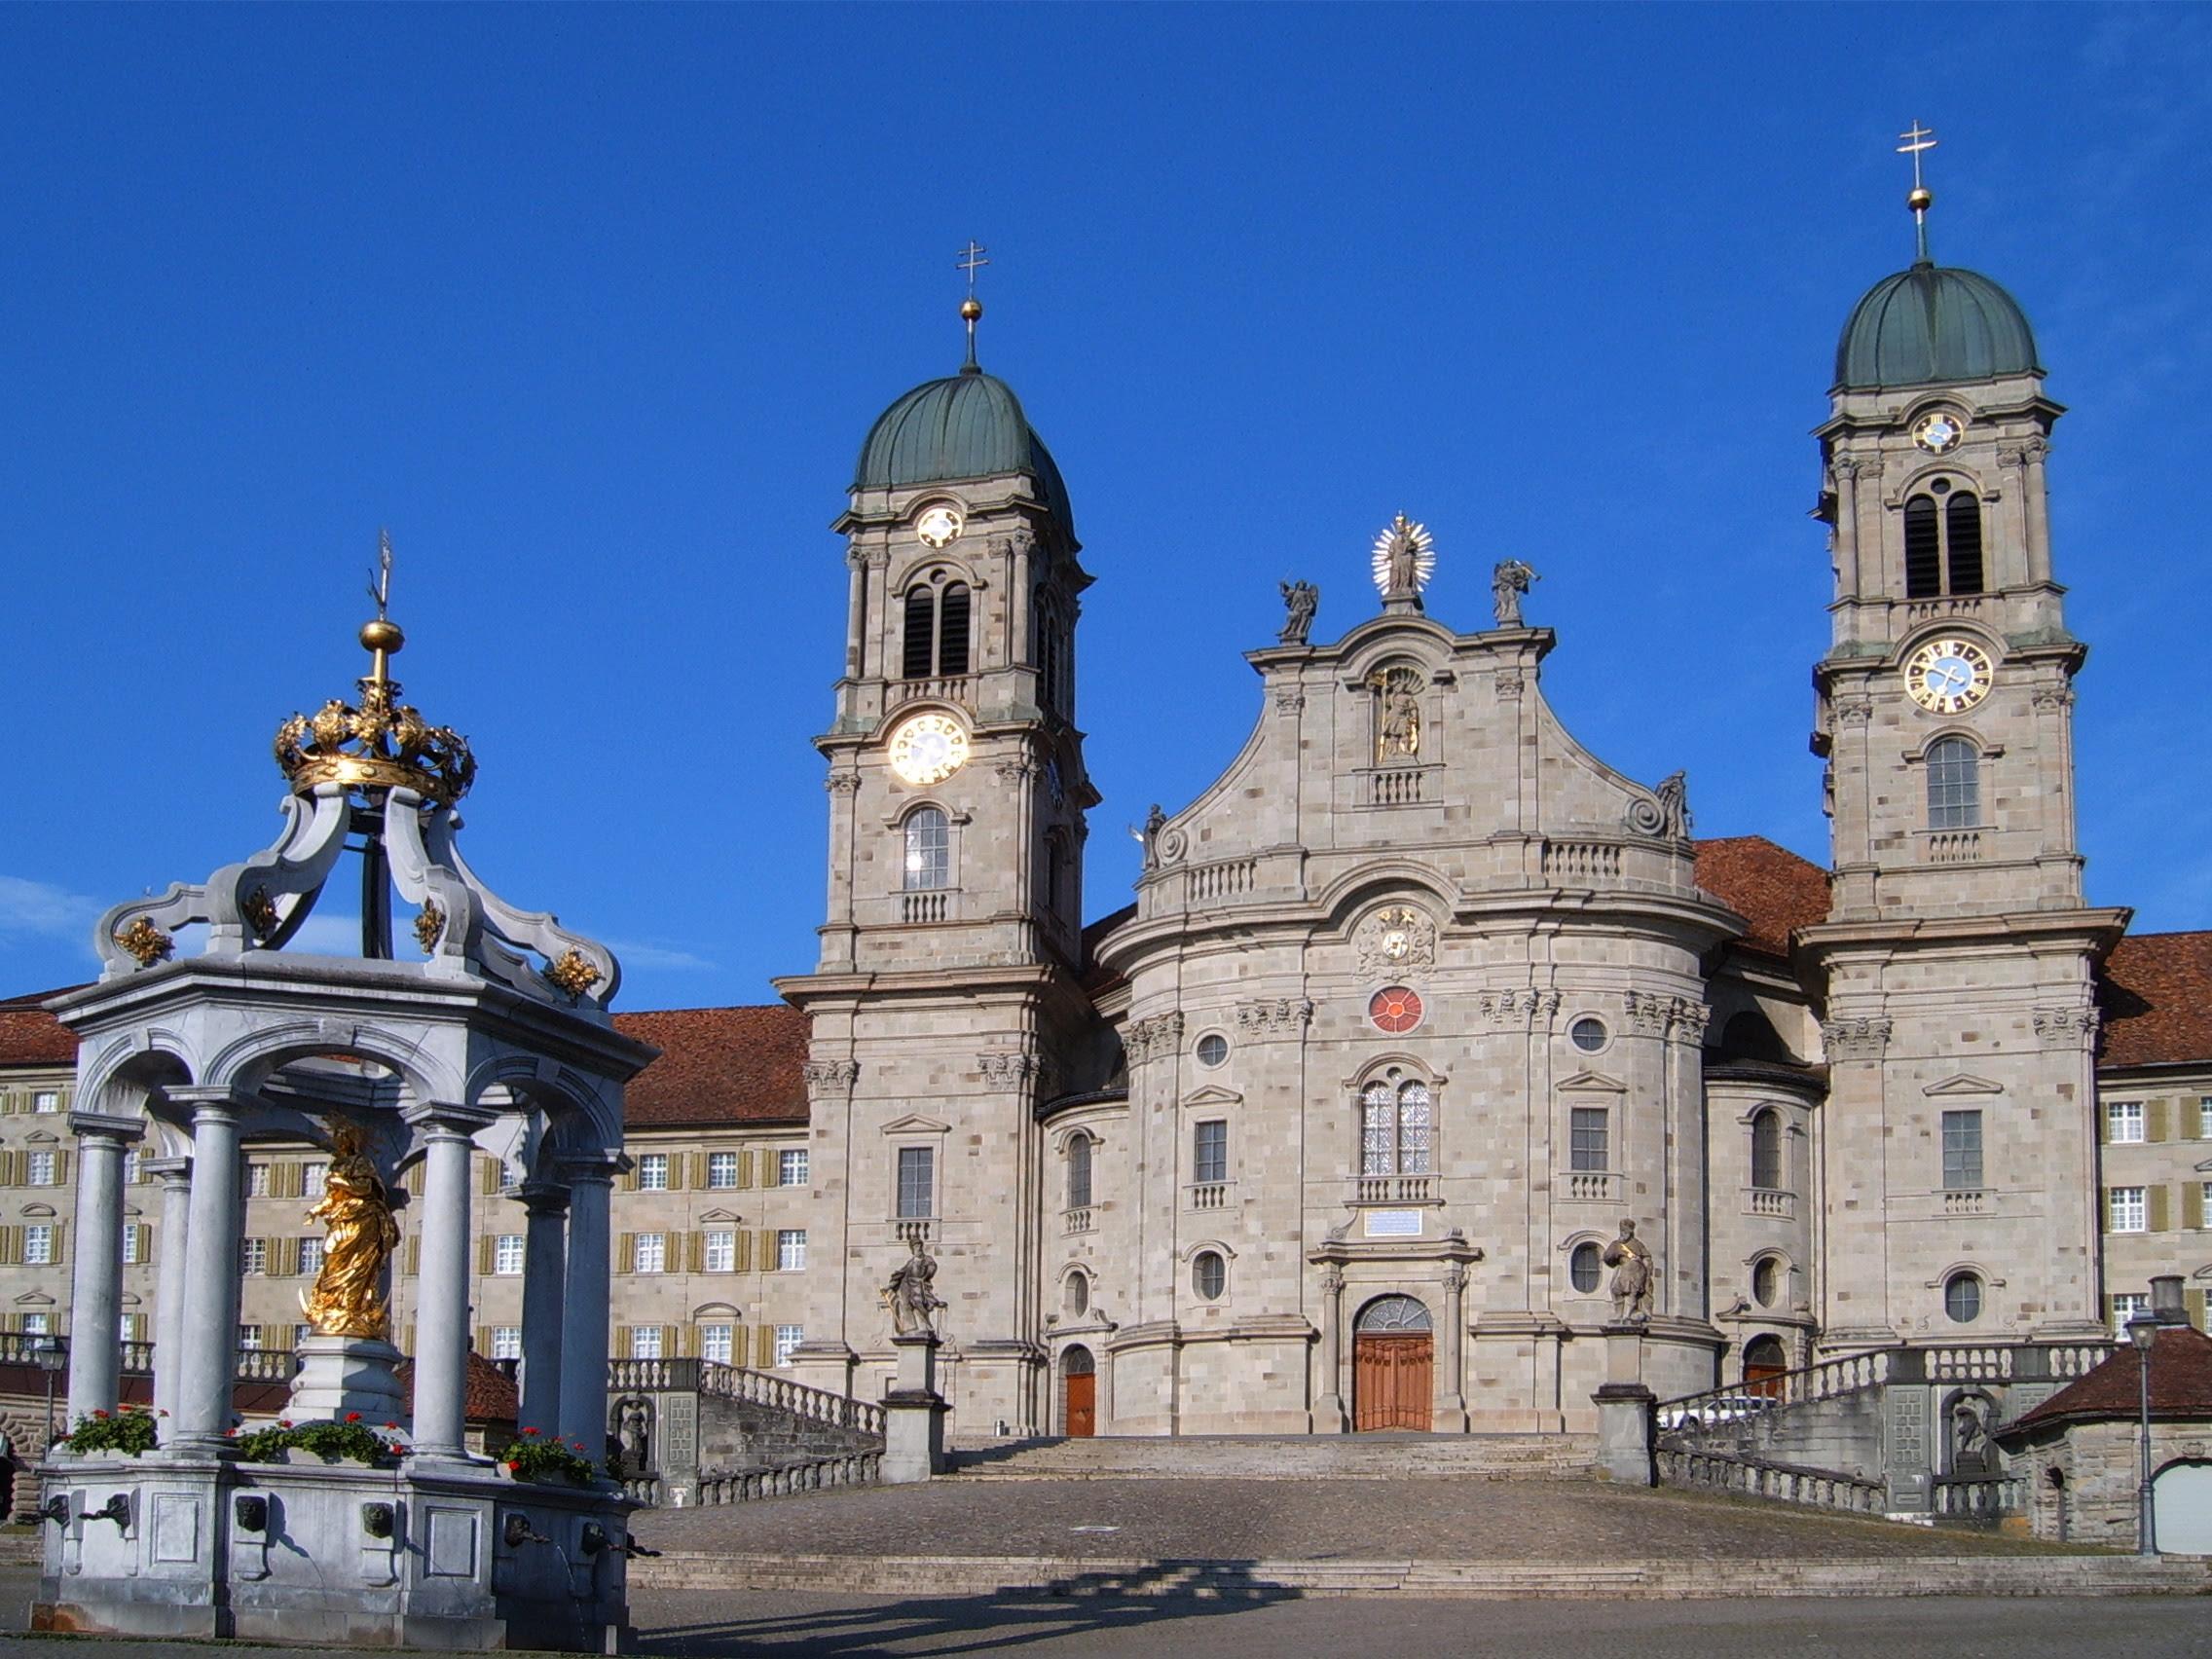 http://upload.wikimedia.org/wikipedia/commons/5/58/Kloster_Einsiedeln_001.jpg